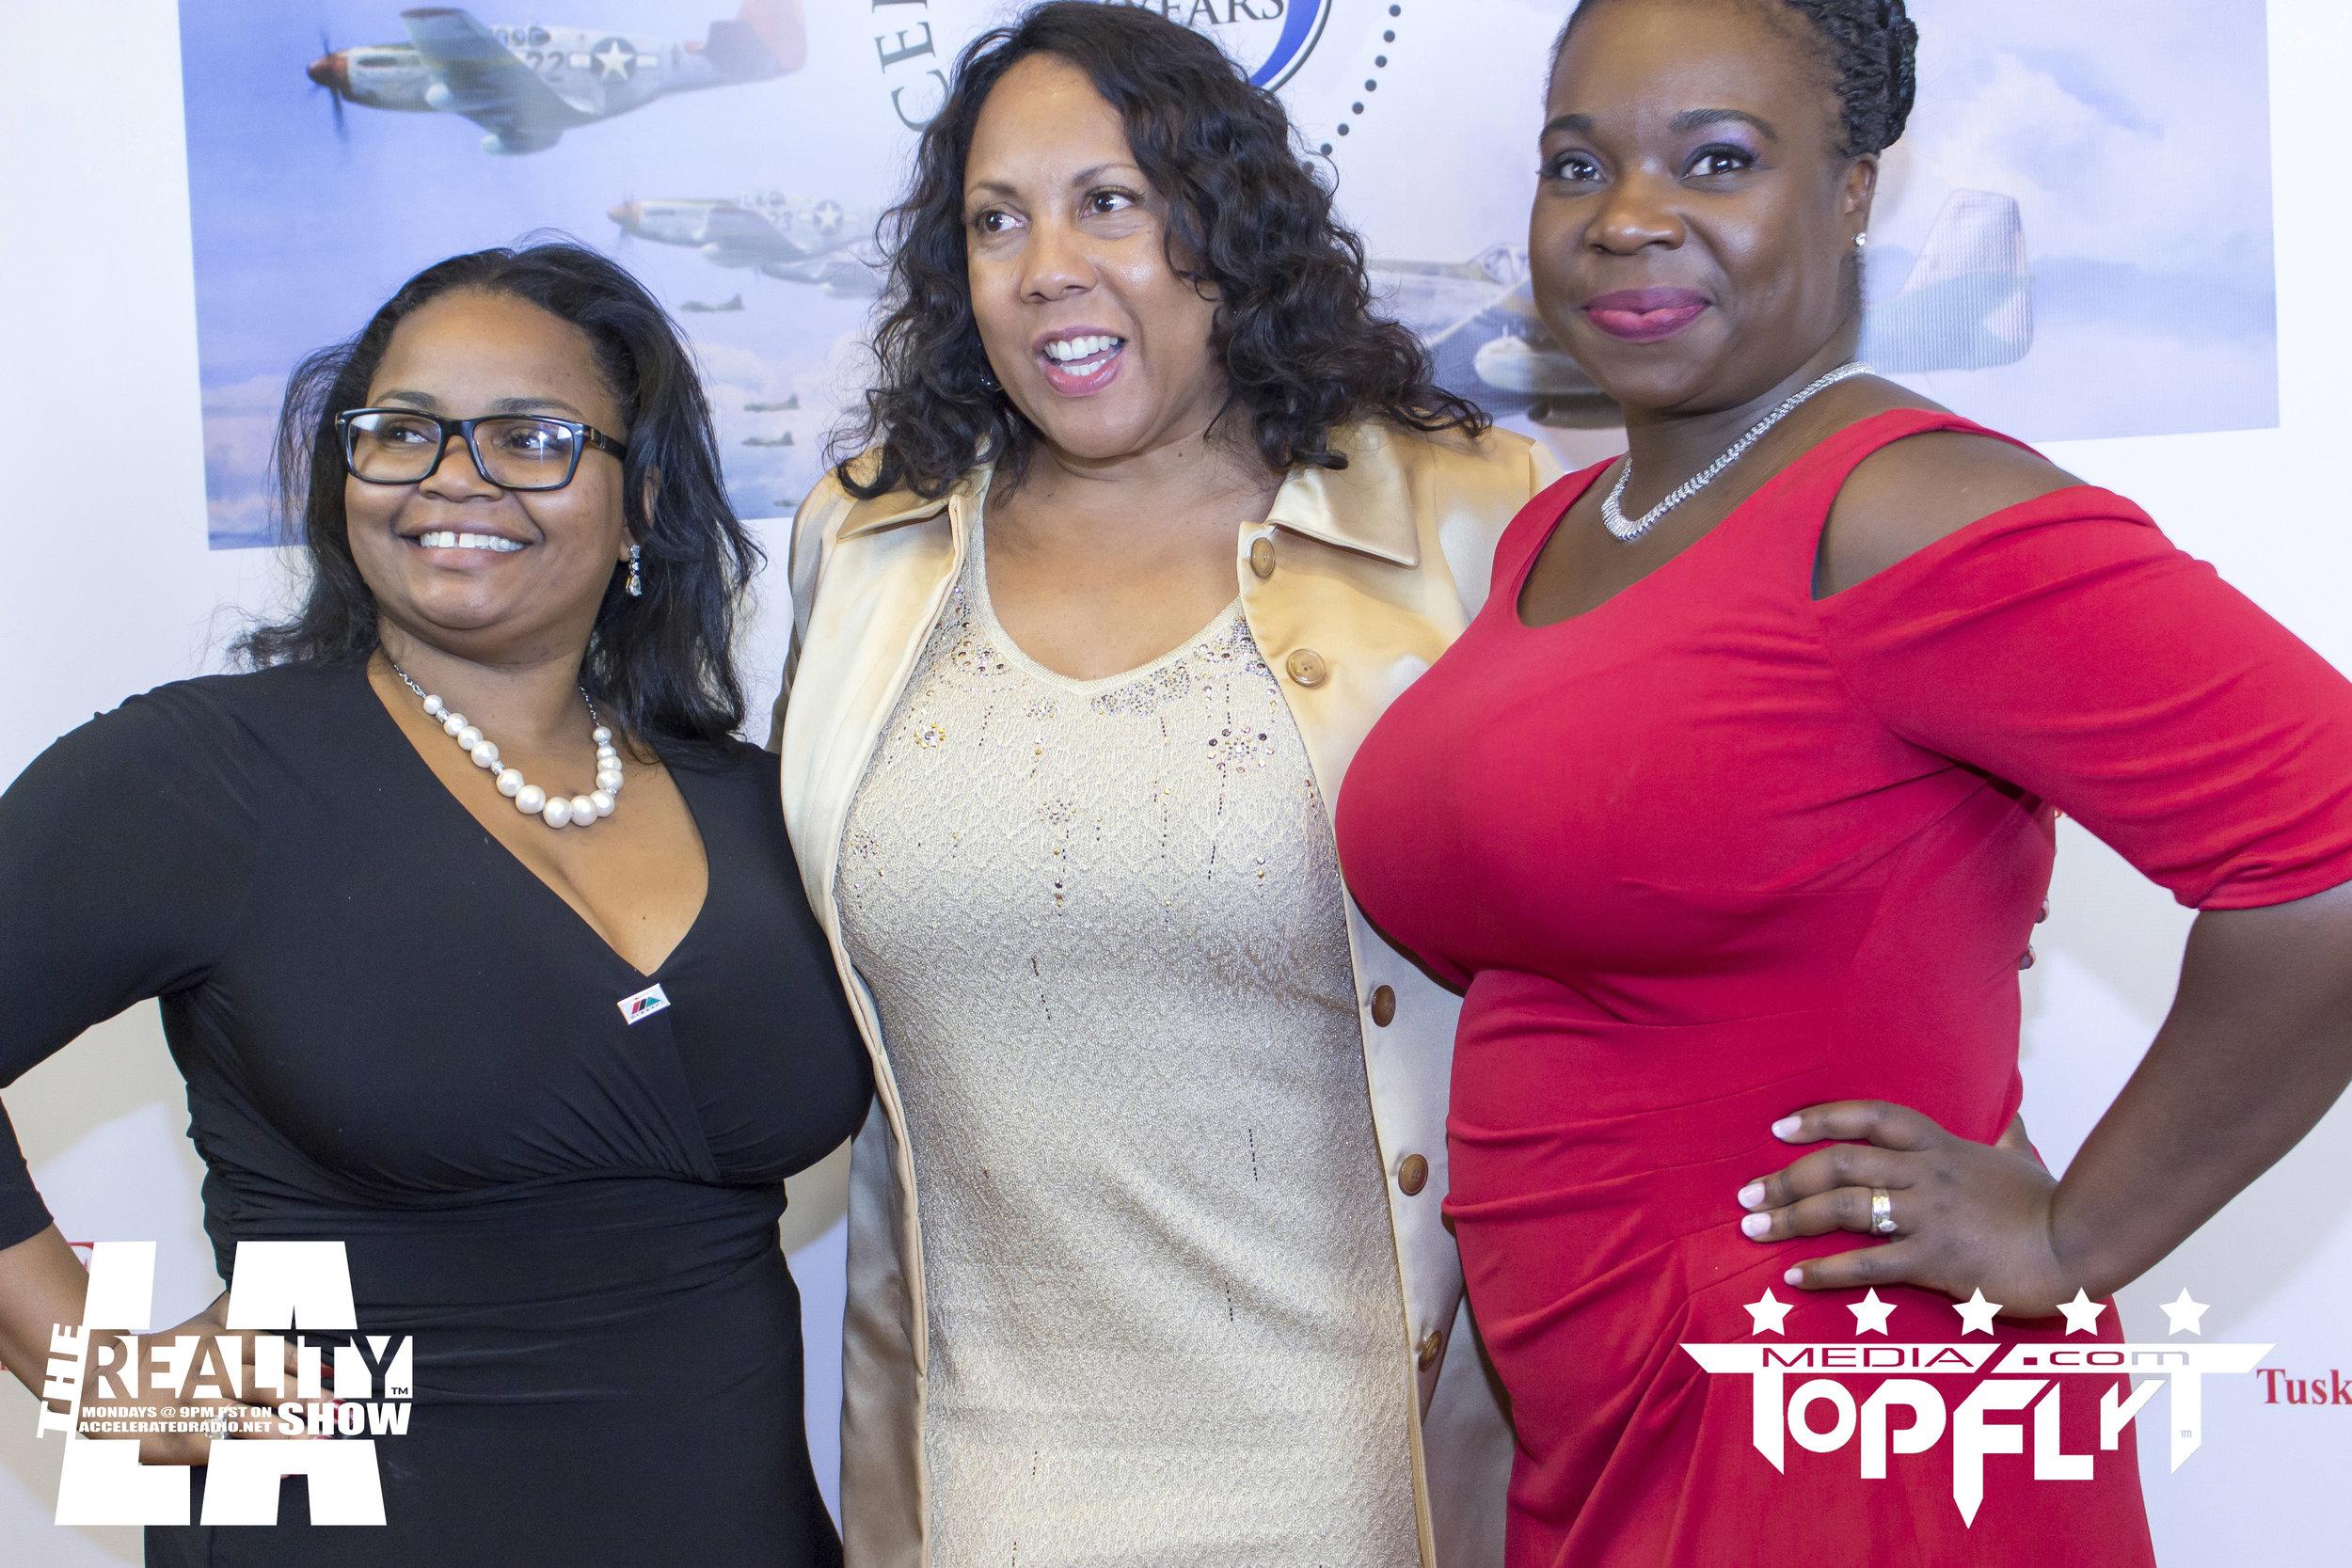 The Reality Show LA - Tuskegee Airmen 75th Anniversary VIP Reception_91.jpg